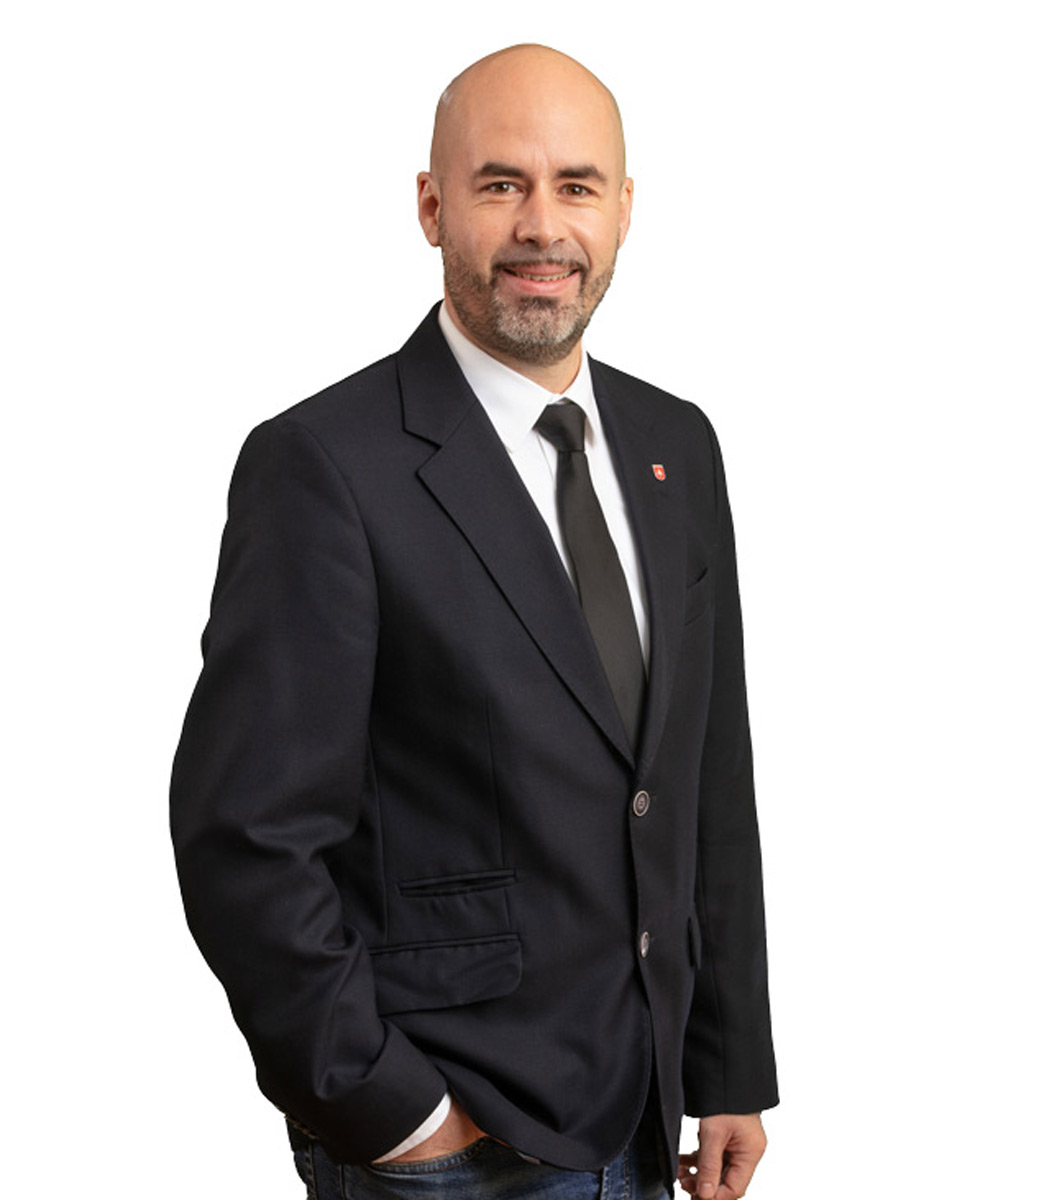 Matthias Meier-Moreno